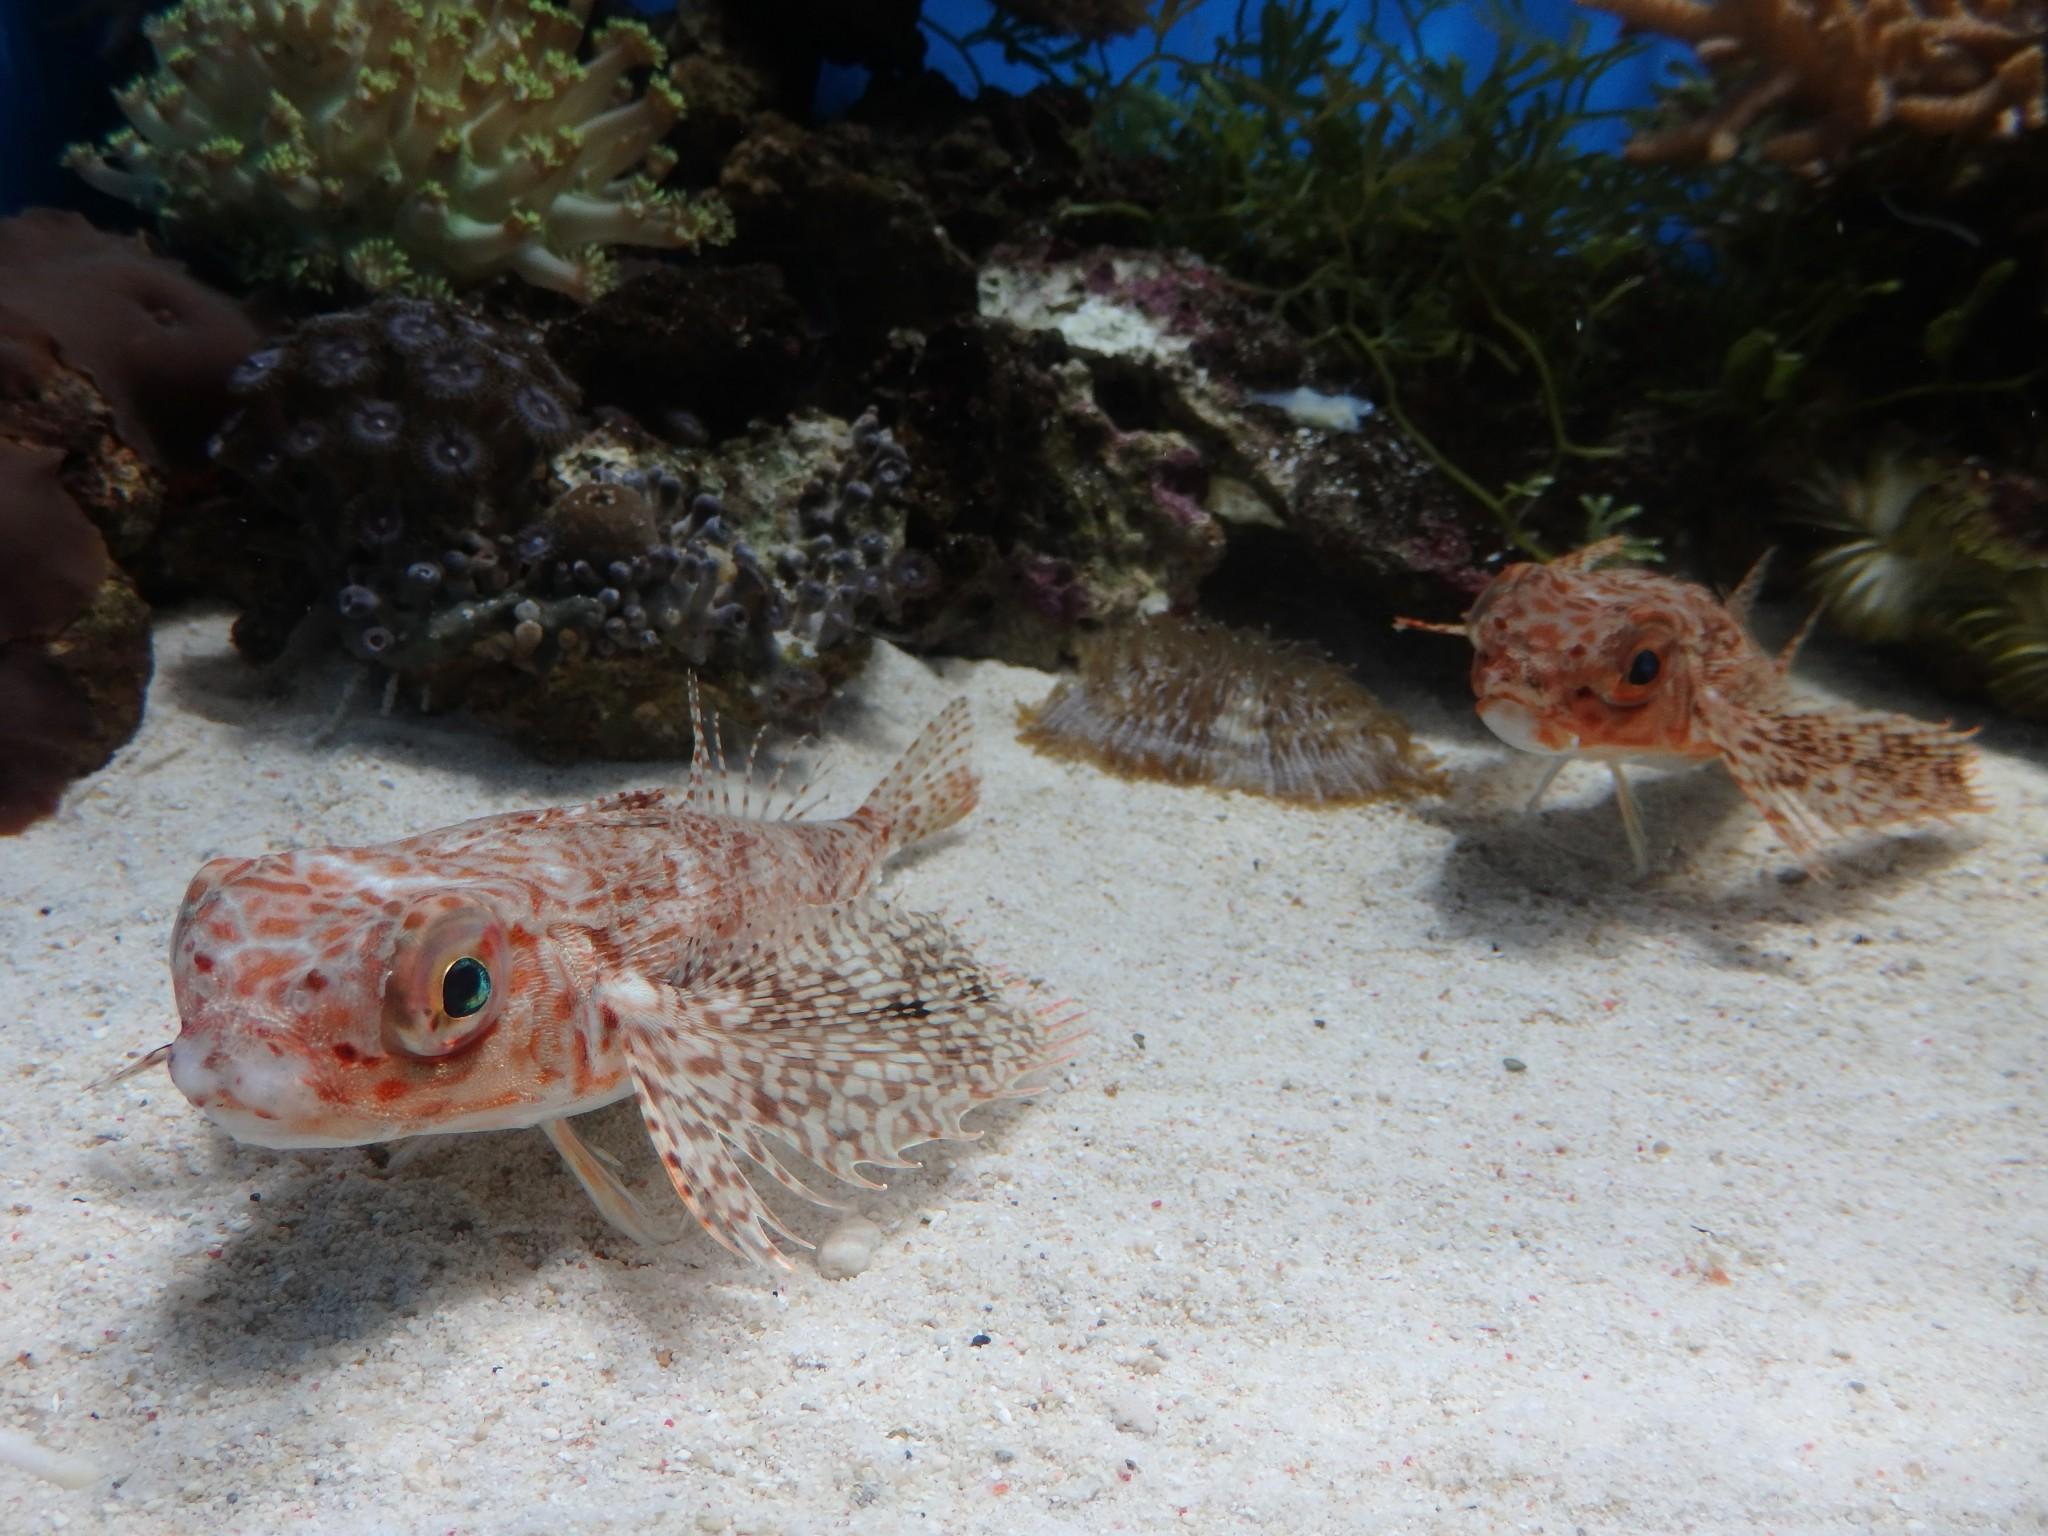 Numazu Aquarium: Discover the World's Most Bizarre Creatures